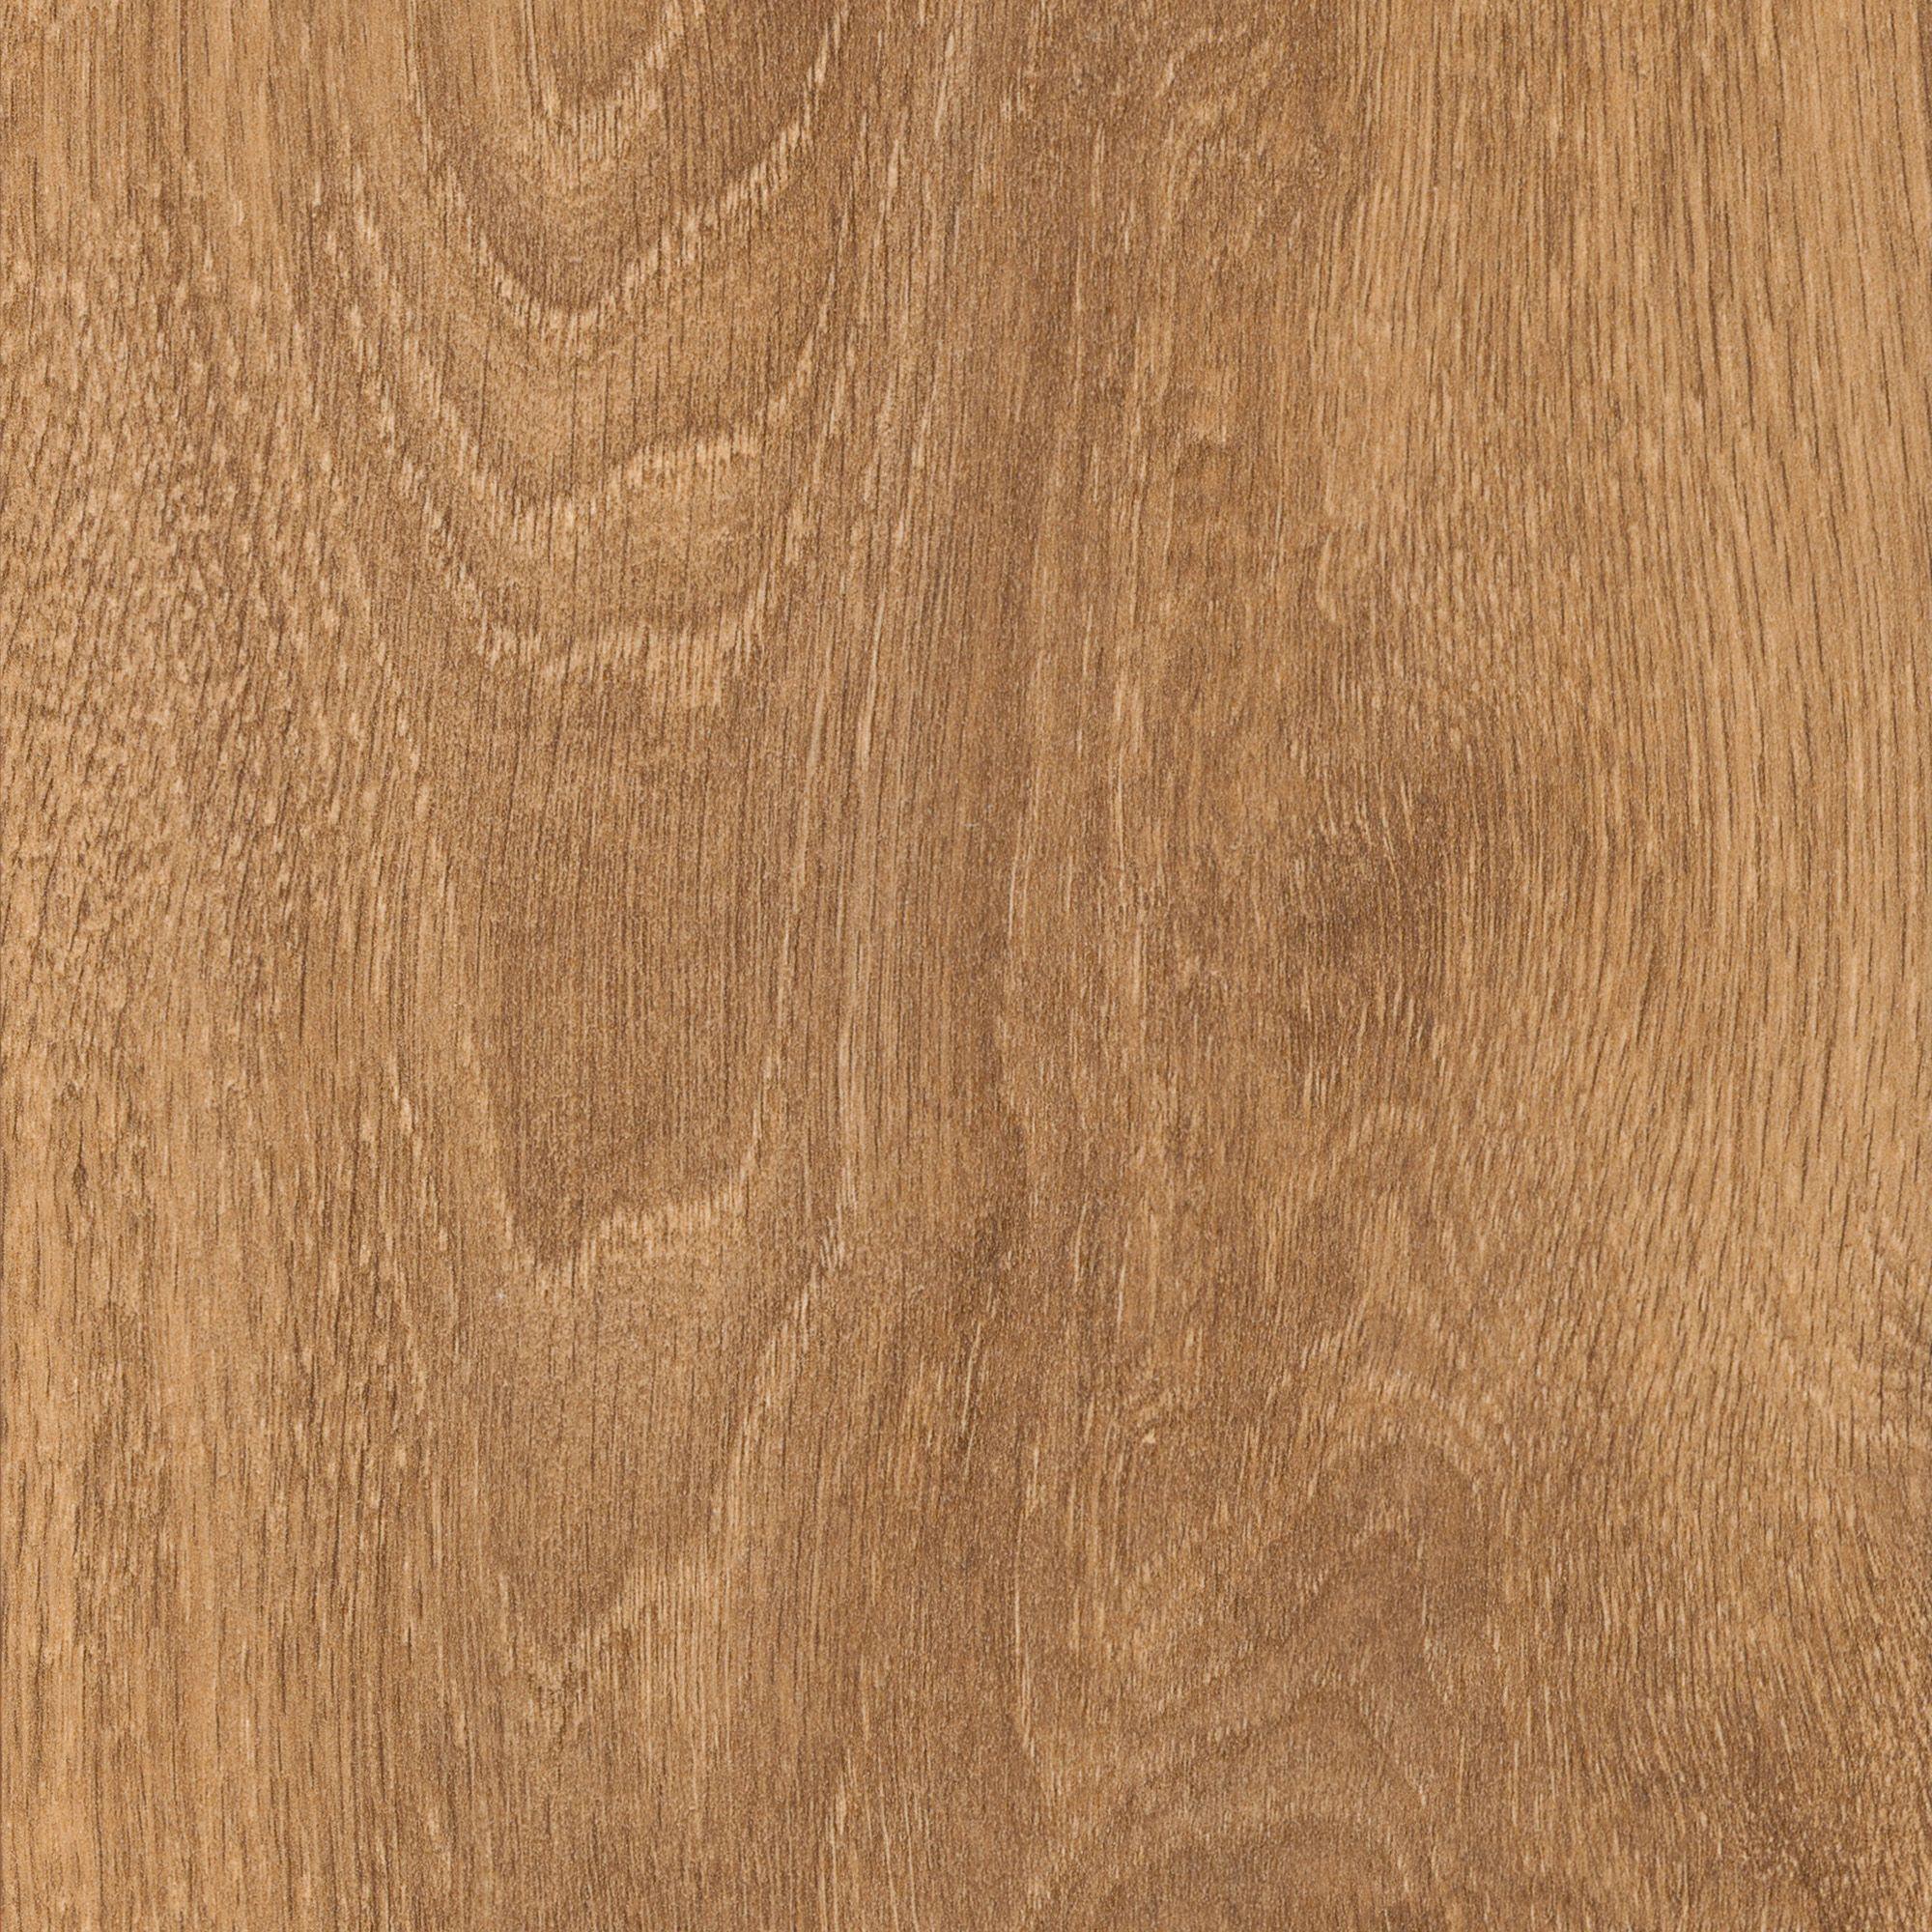 Andante white oak effect laminate flooring sample for Laminate flooring examples